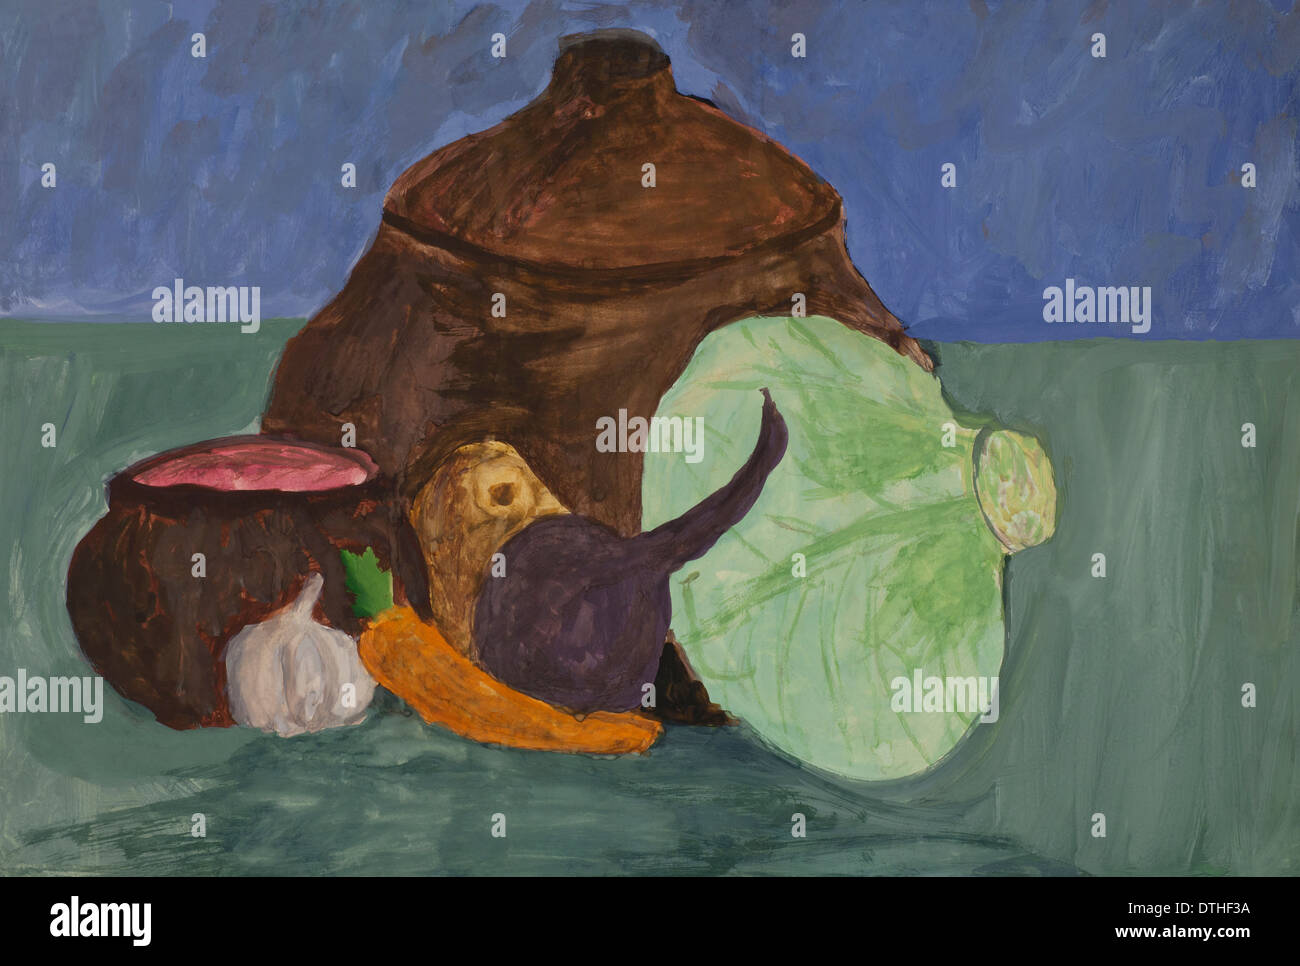 Illustrations Cabbage Stockfotos & Illustrations Cabbage Bilder - Alamy